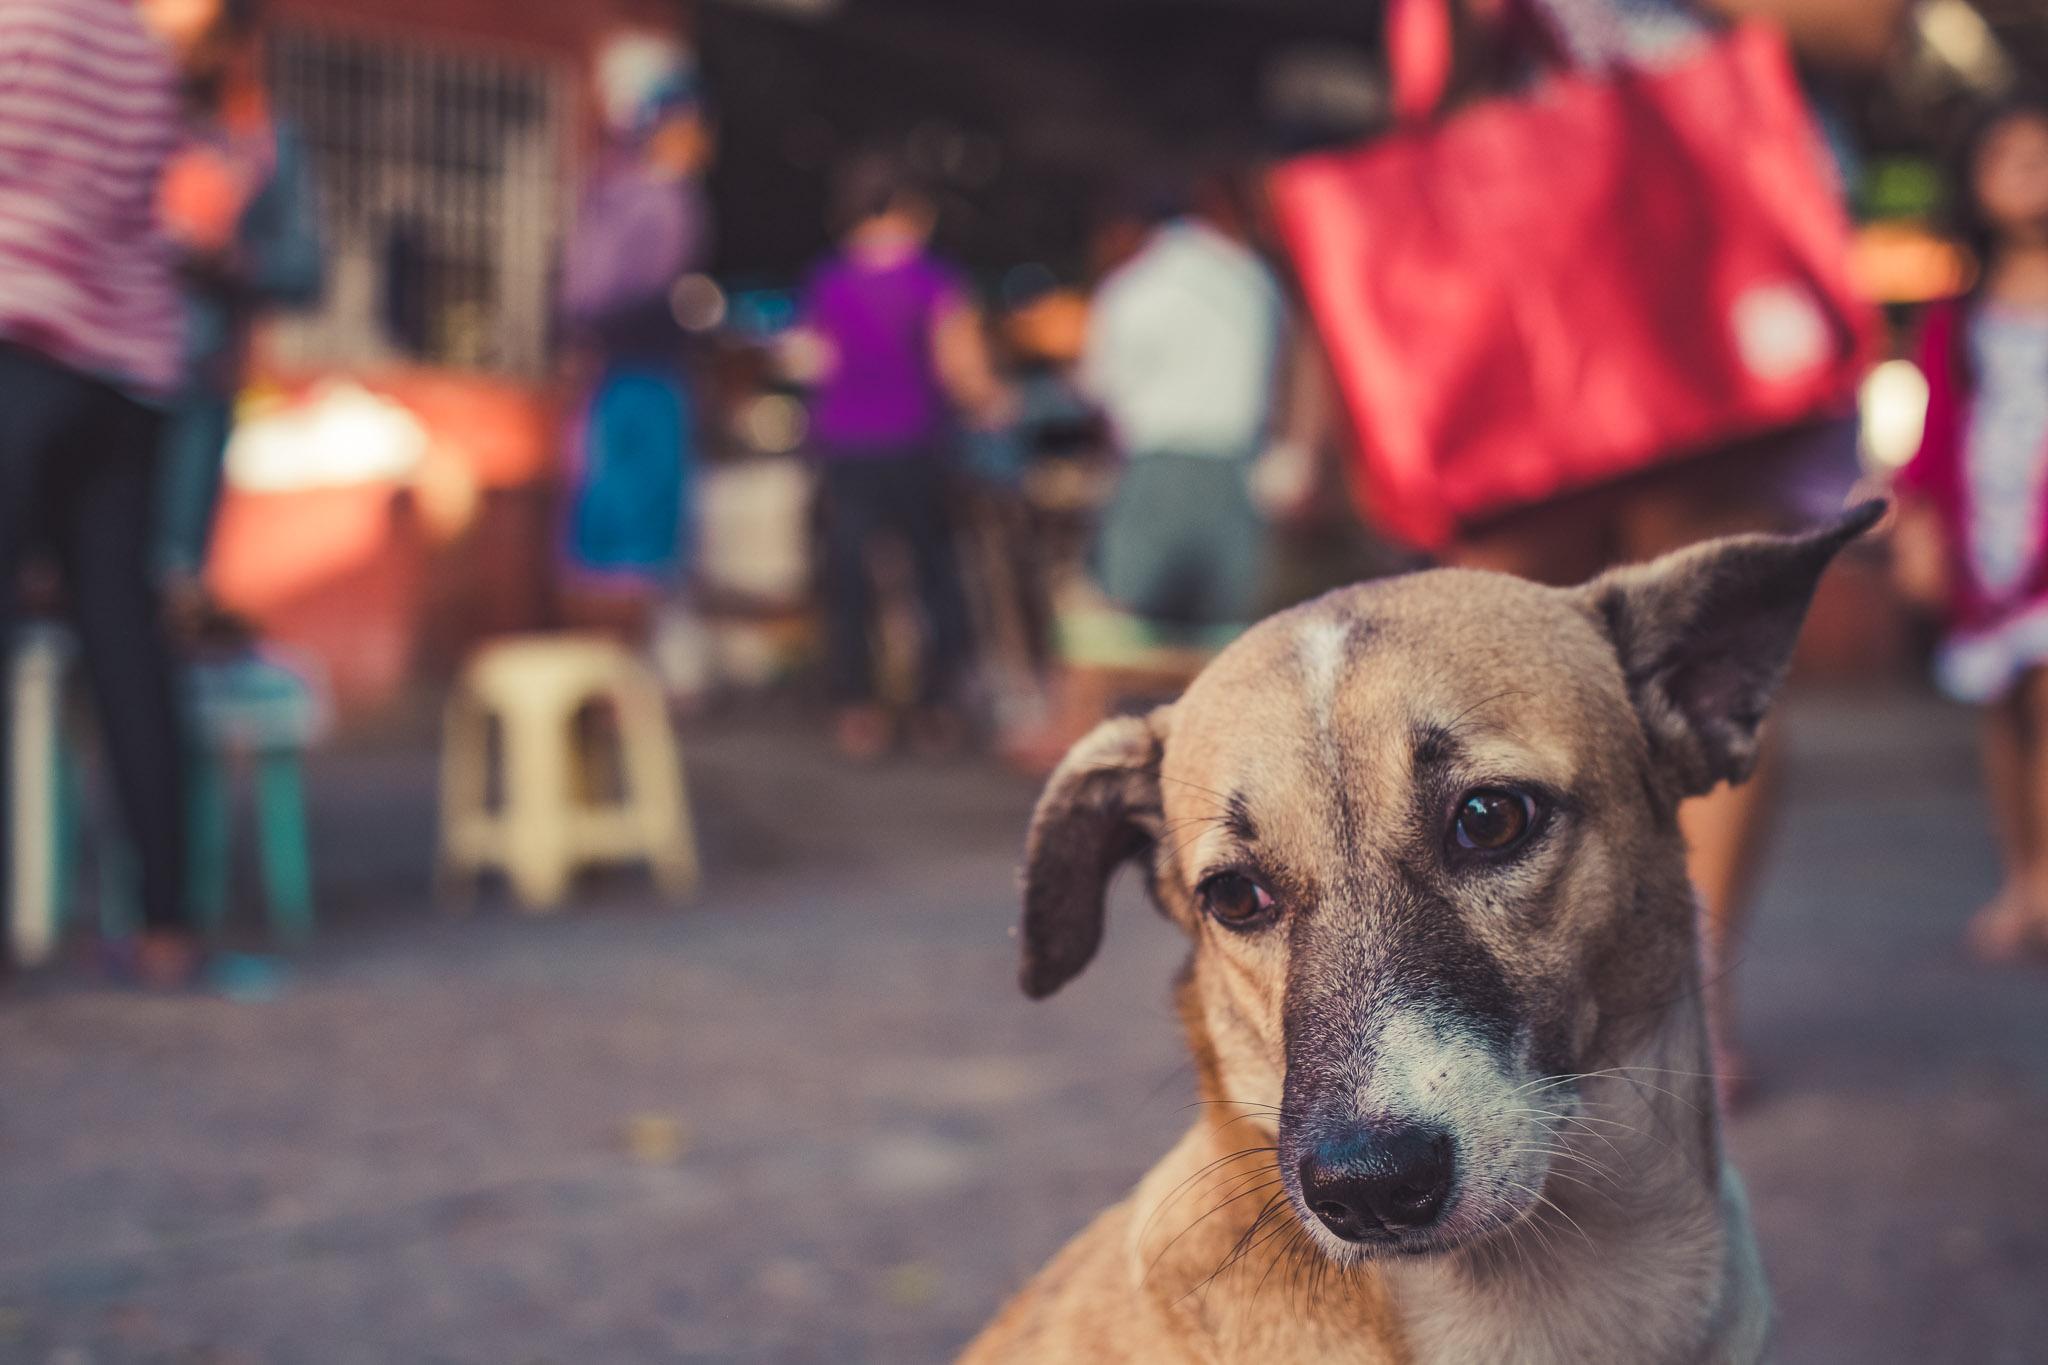 Sunday Market in Poblacion, San Jose